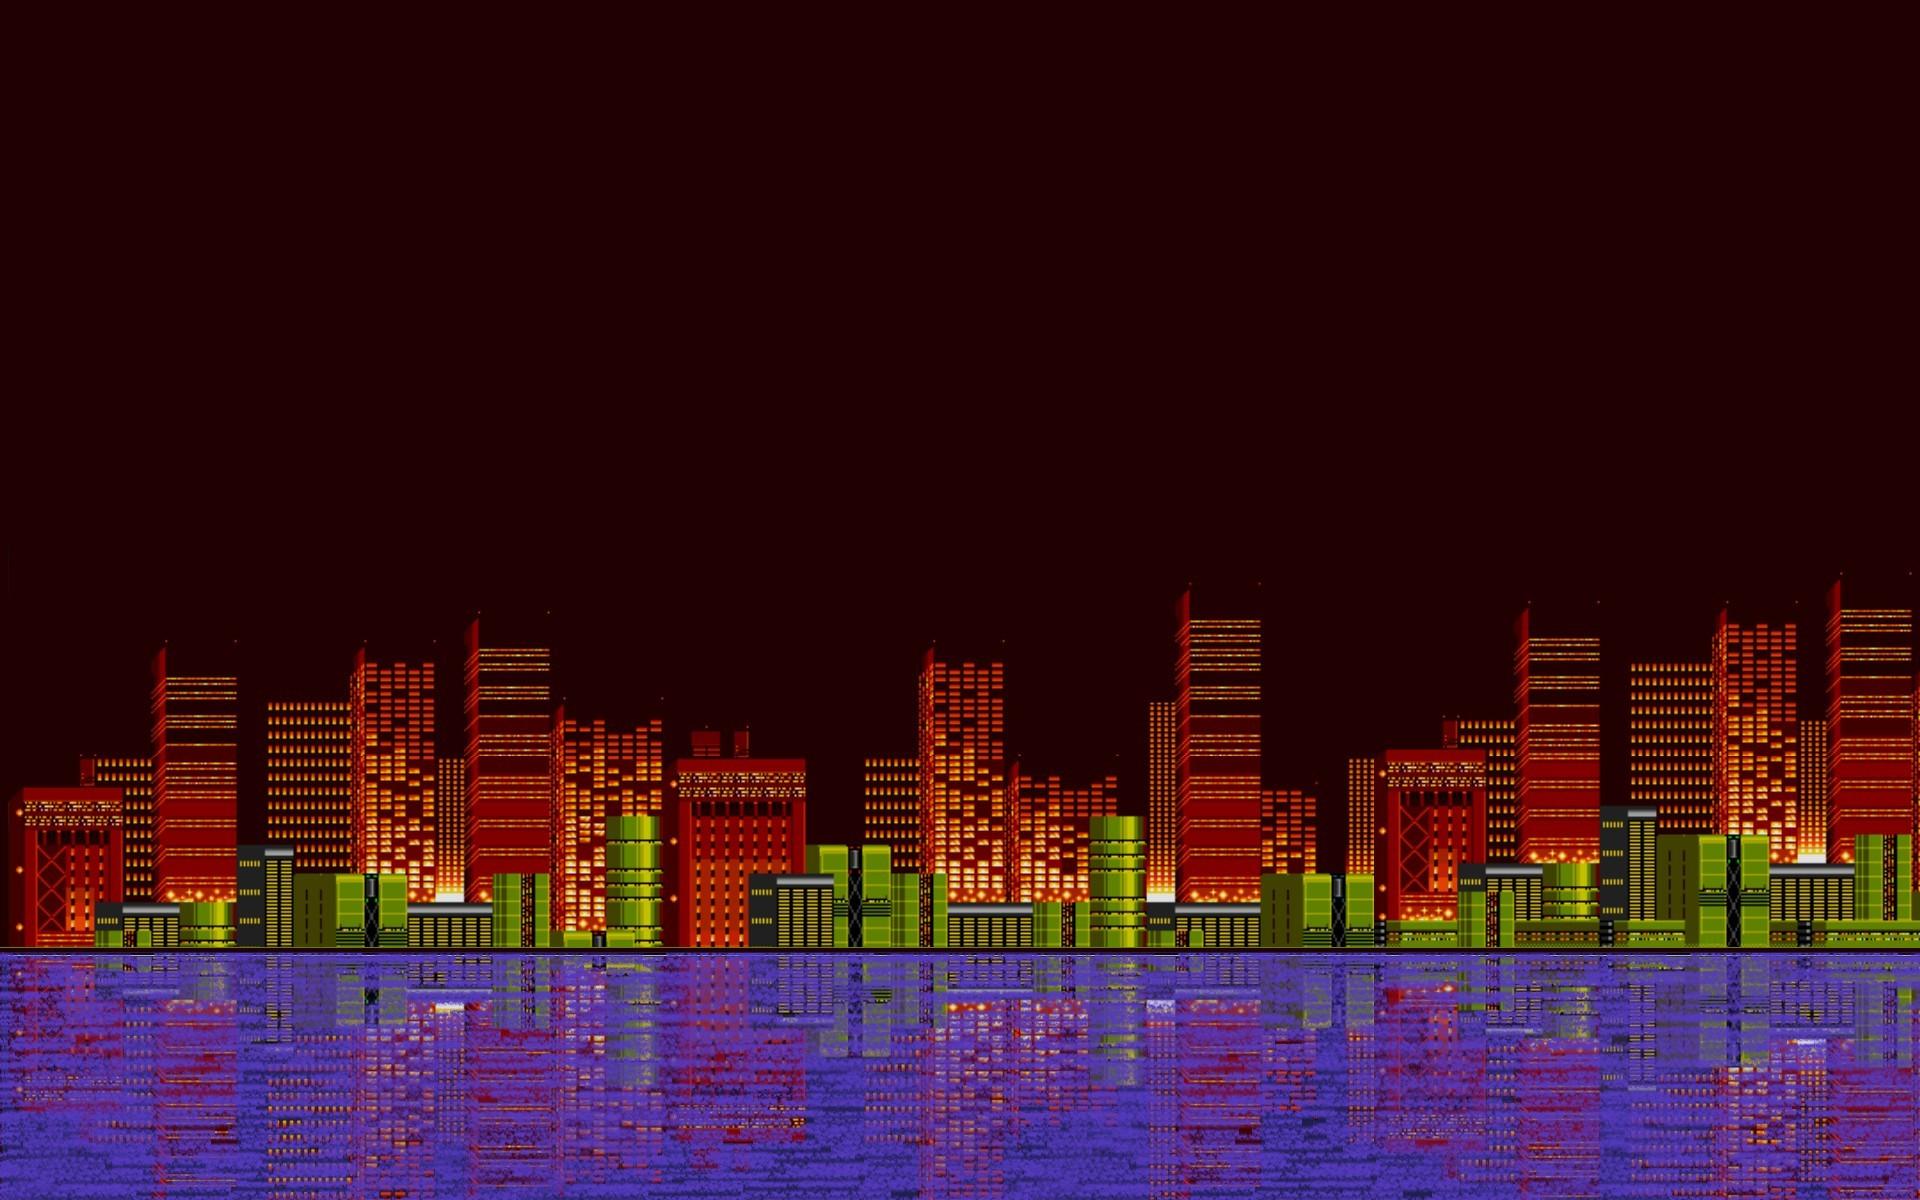 Res: 1920x1200, pixel art, 16 bit, Sega, Sonic the Hedgehog, City Wallpapers HD / Desktop  and Mobile Backgrounds